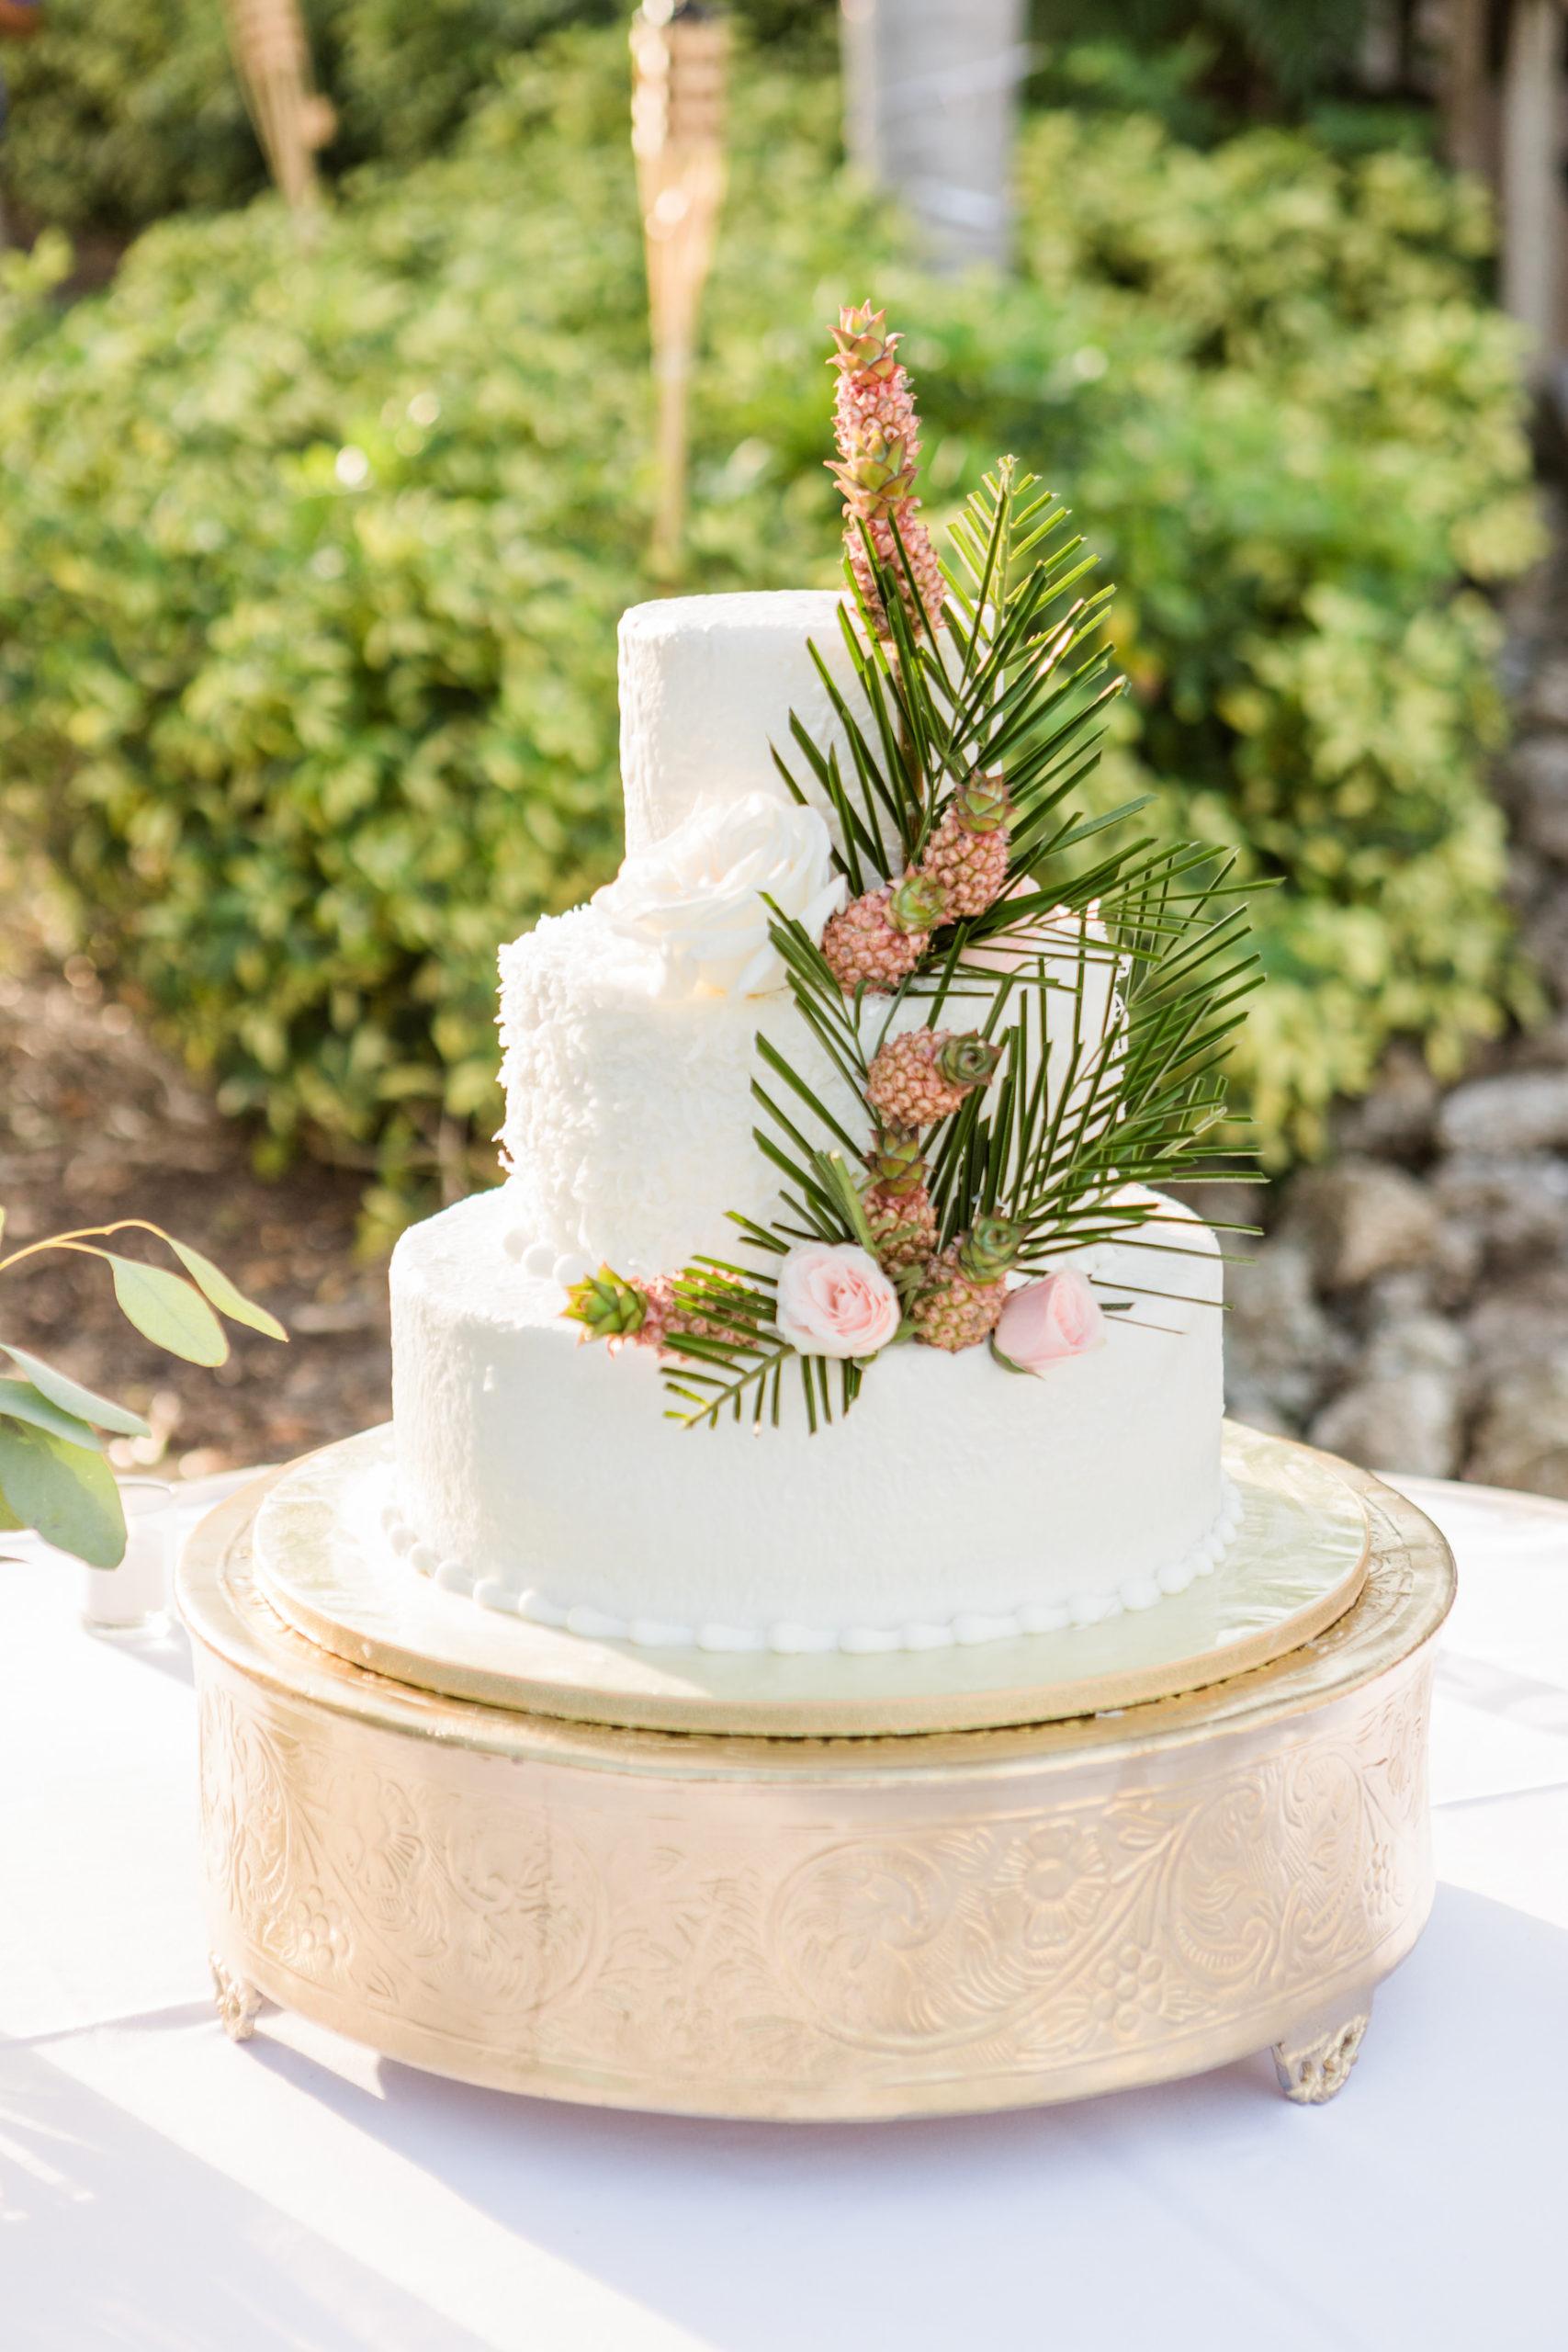 Round Three Tier White Wedding Cake with Tropical Embellishment Decor